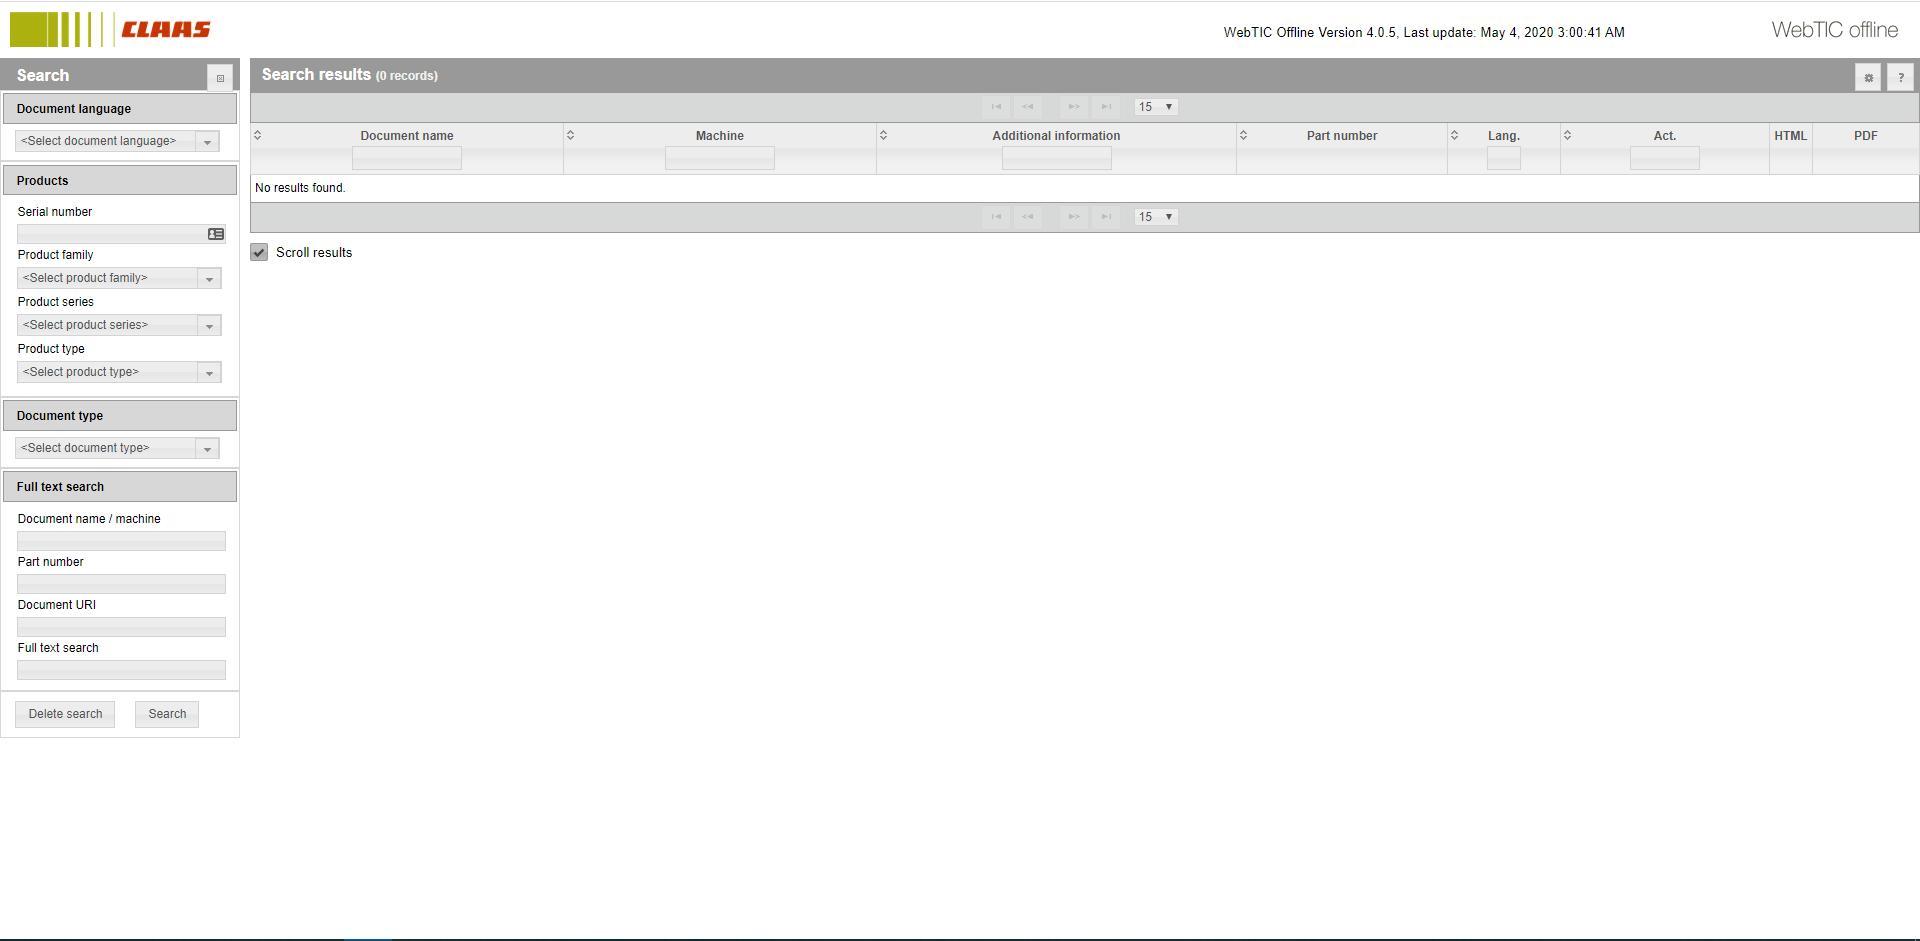 CLAAS_WebTIC_Offline_052020_Operator_Manual_Repair_Manual_and_Service_Documentation